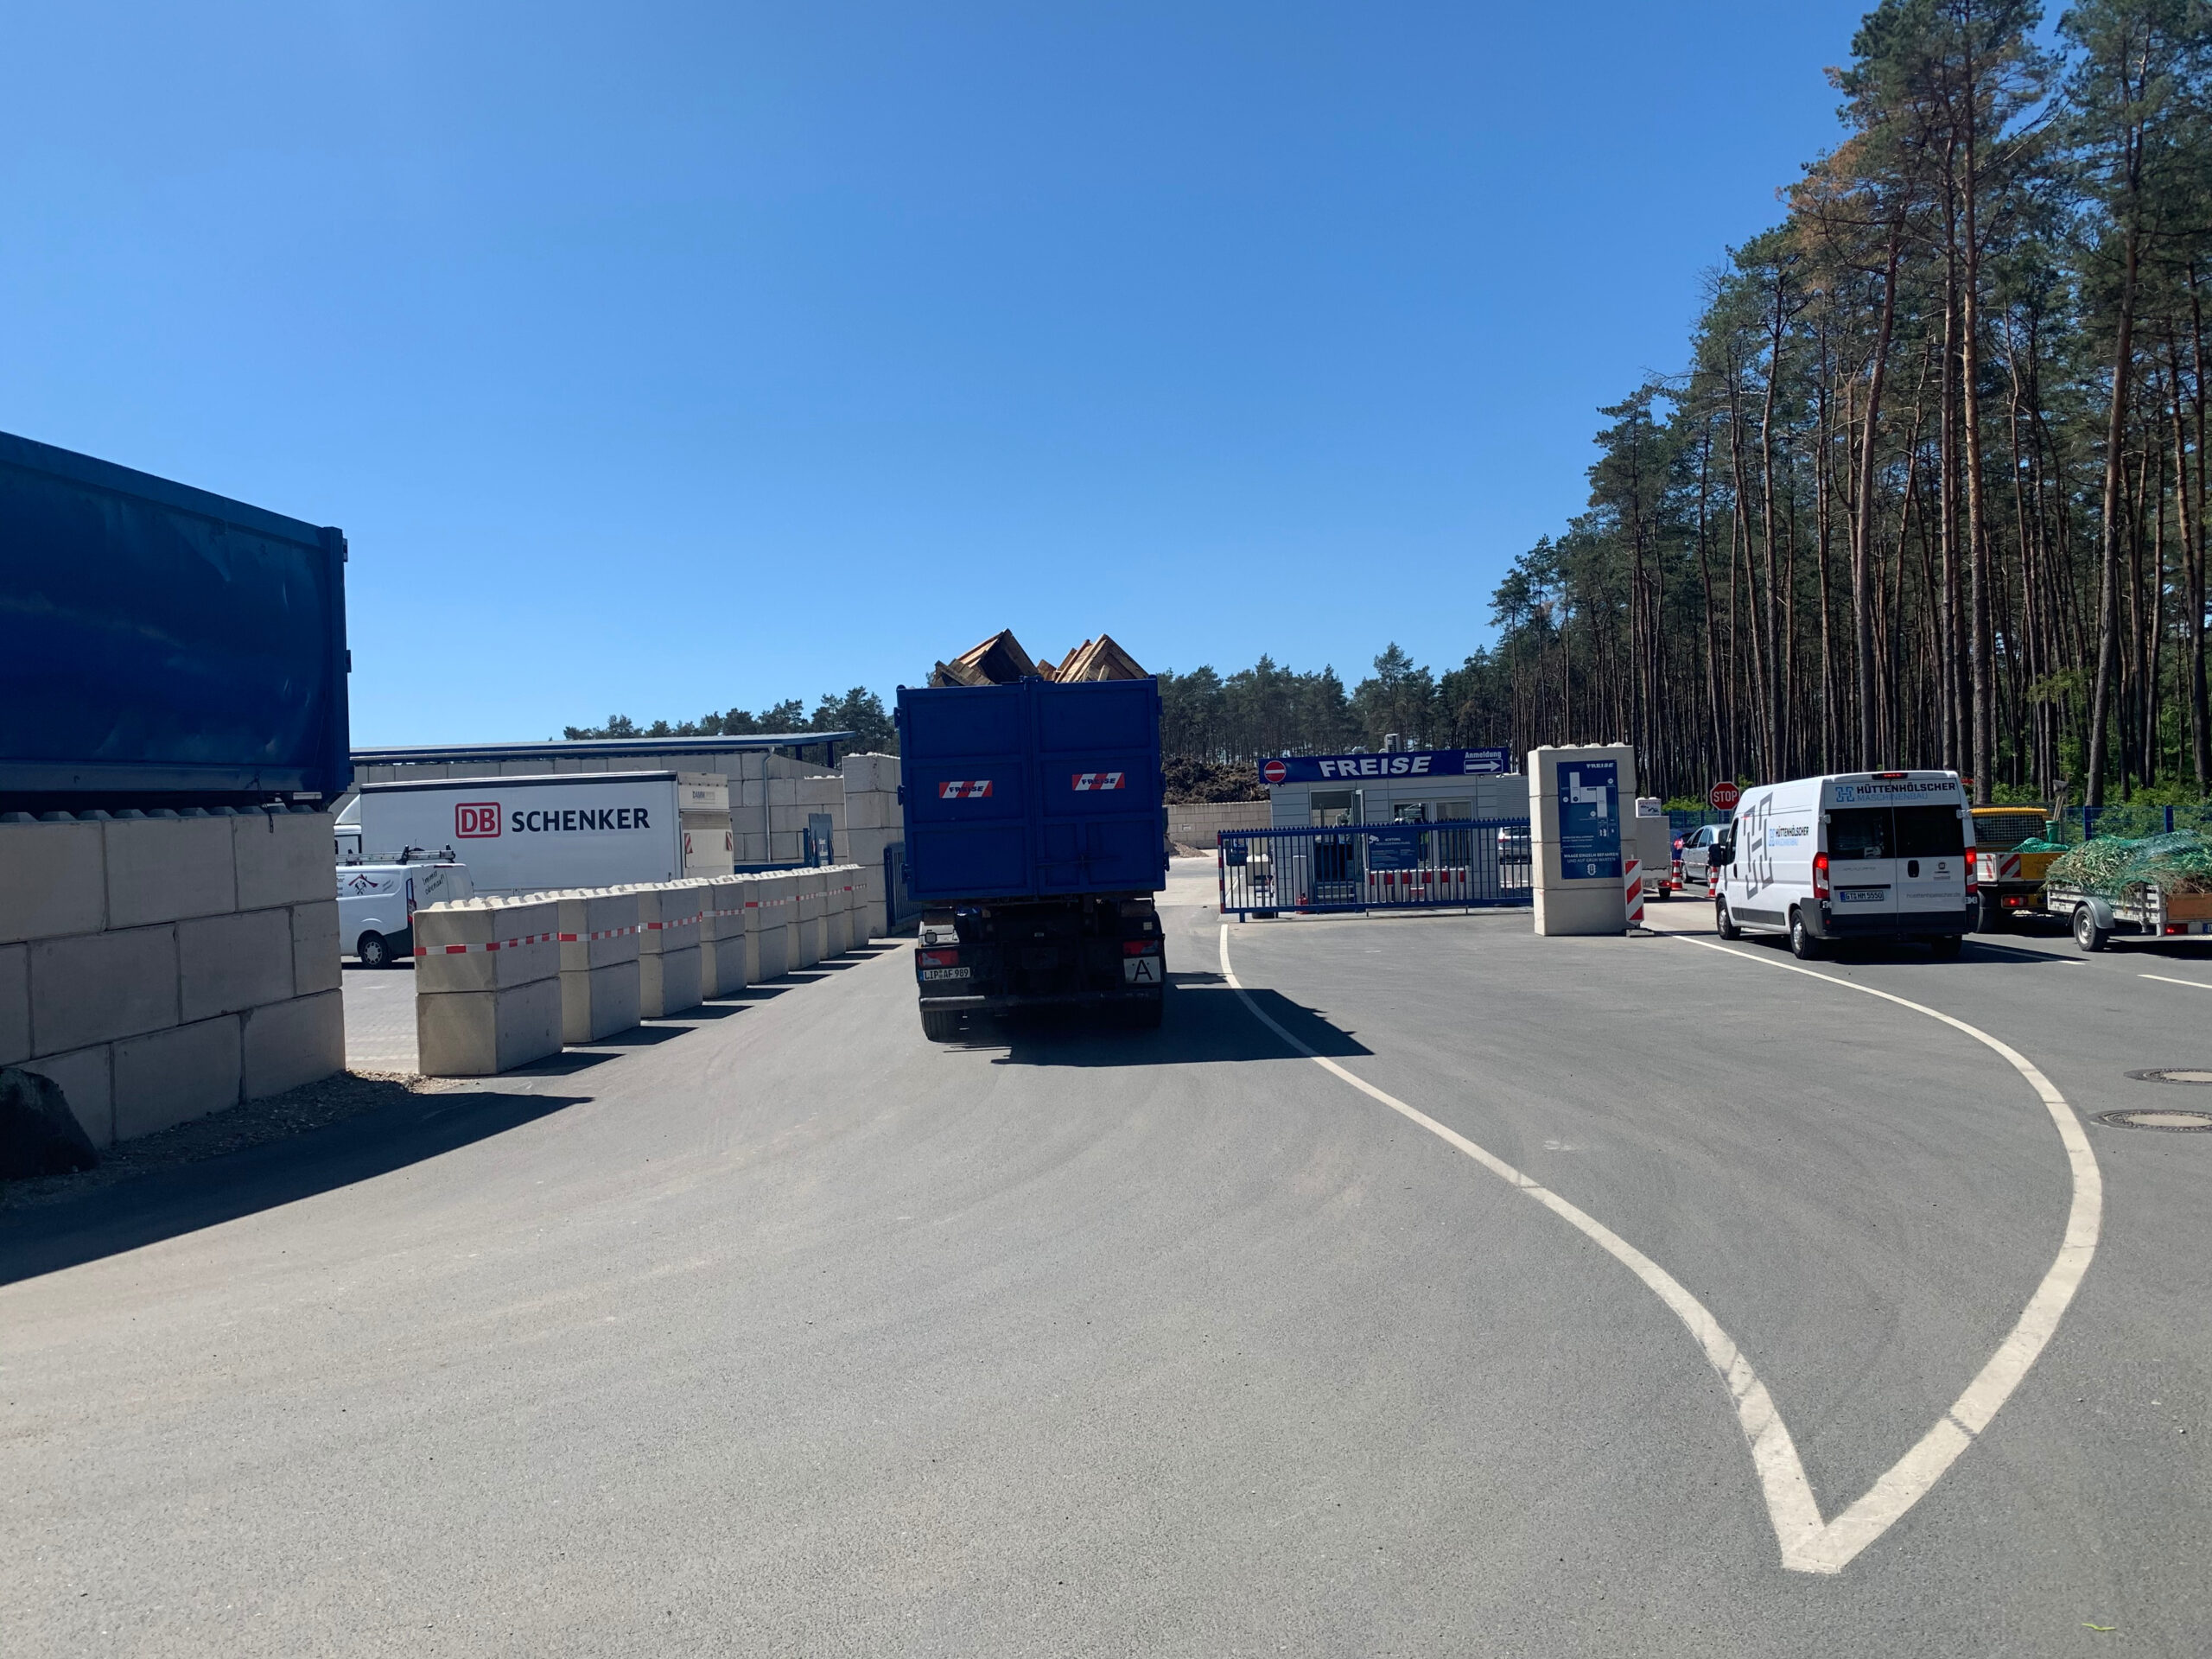 Recyclinghof Wertstoffhof